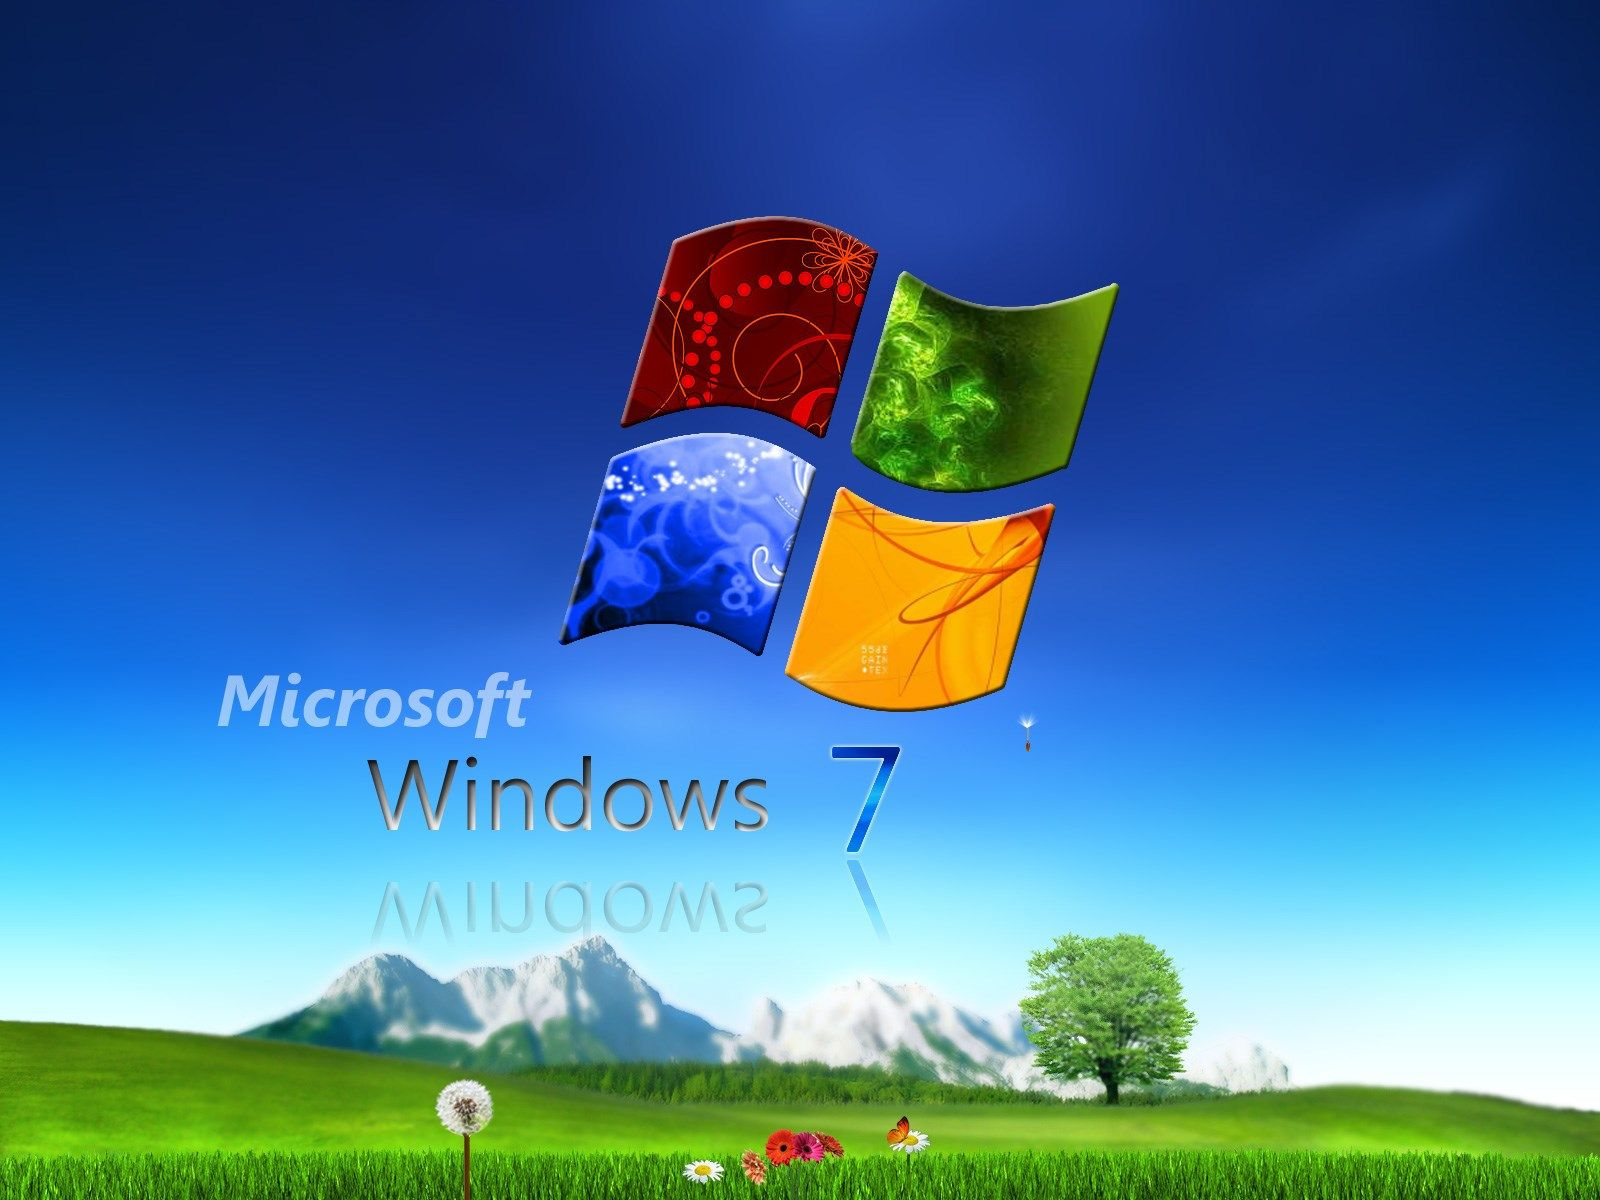 hd nature wallpapers for windows 7 ololoshenka Windows desktop 1600x1200